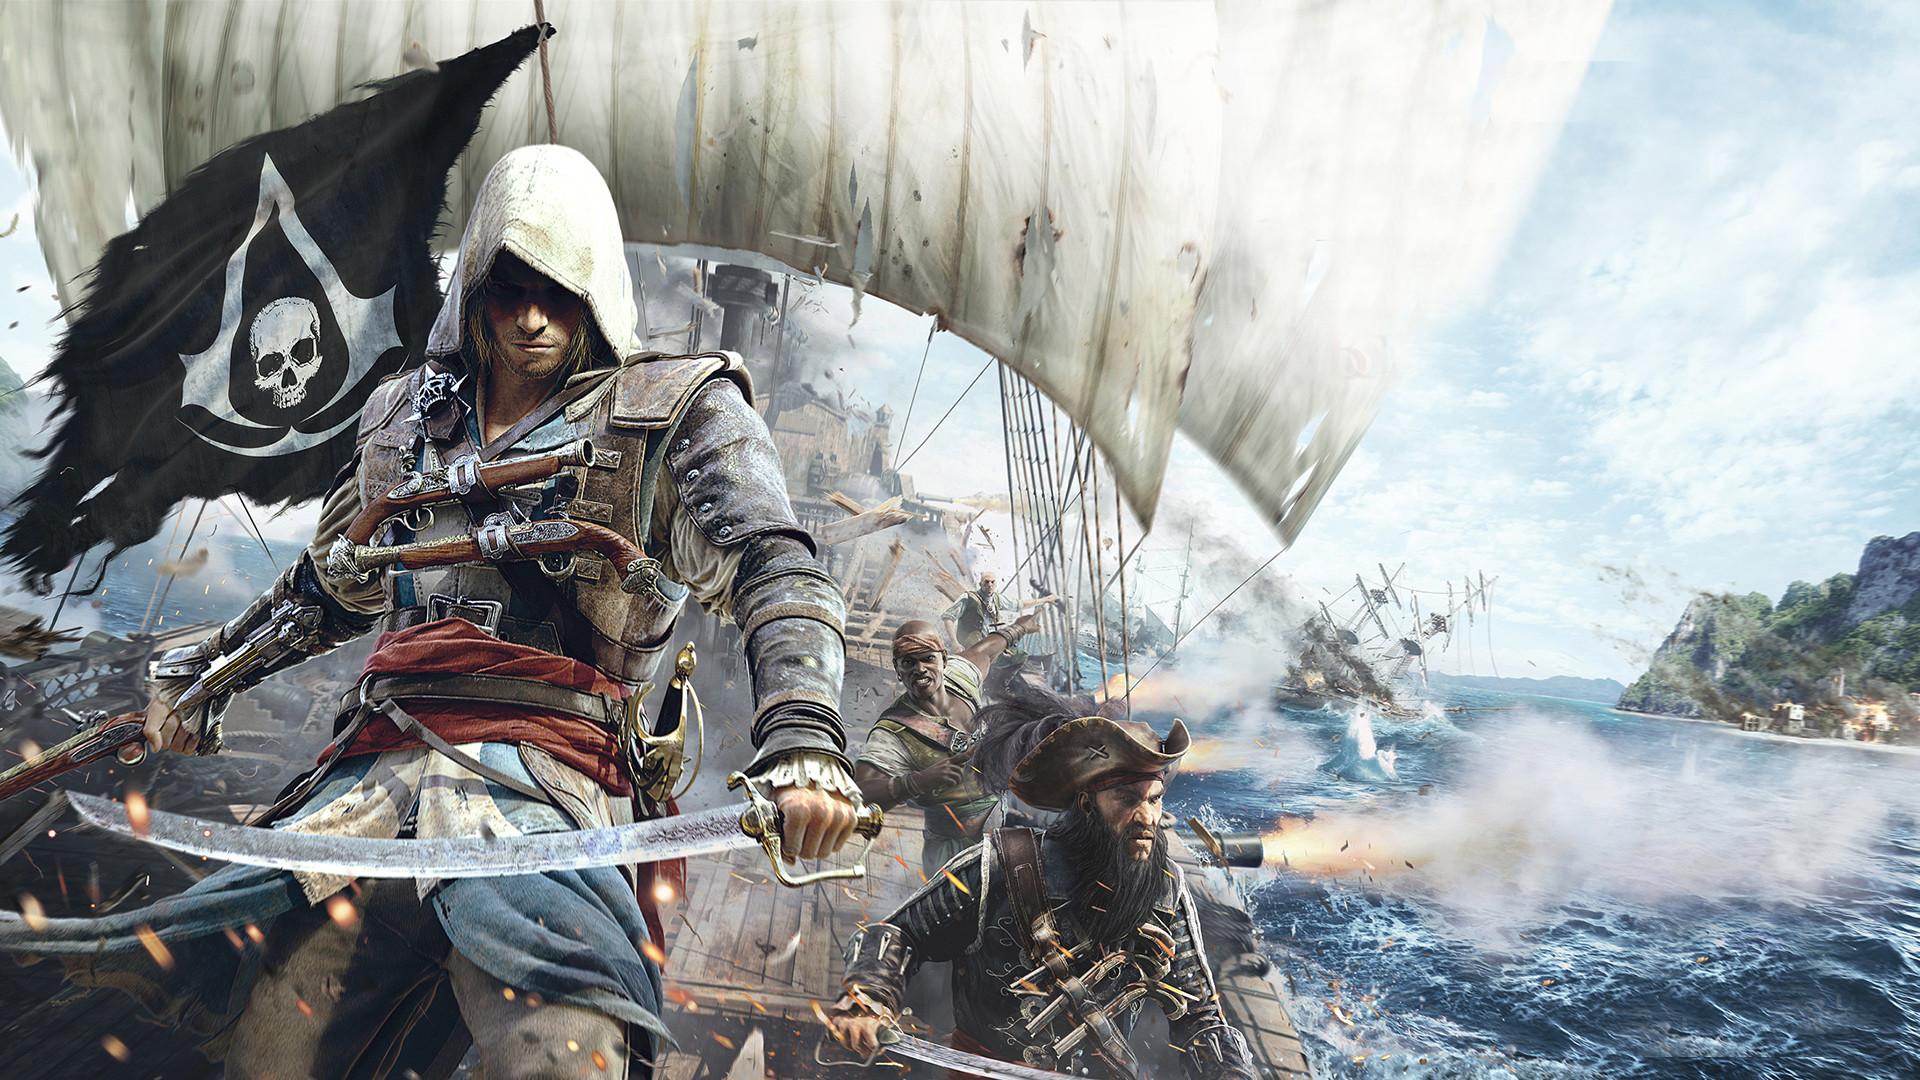 Assassins Creed 4 Black Flag Game